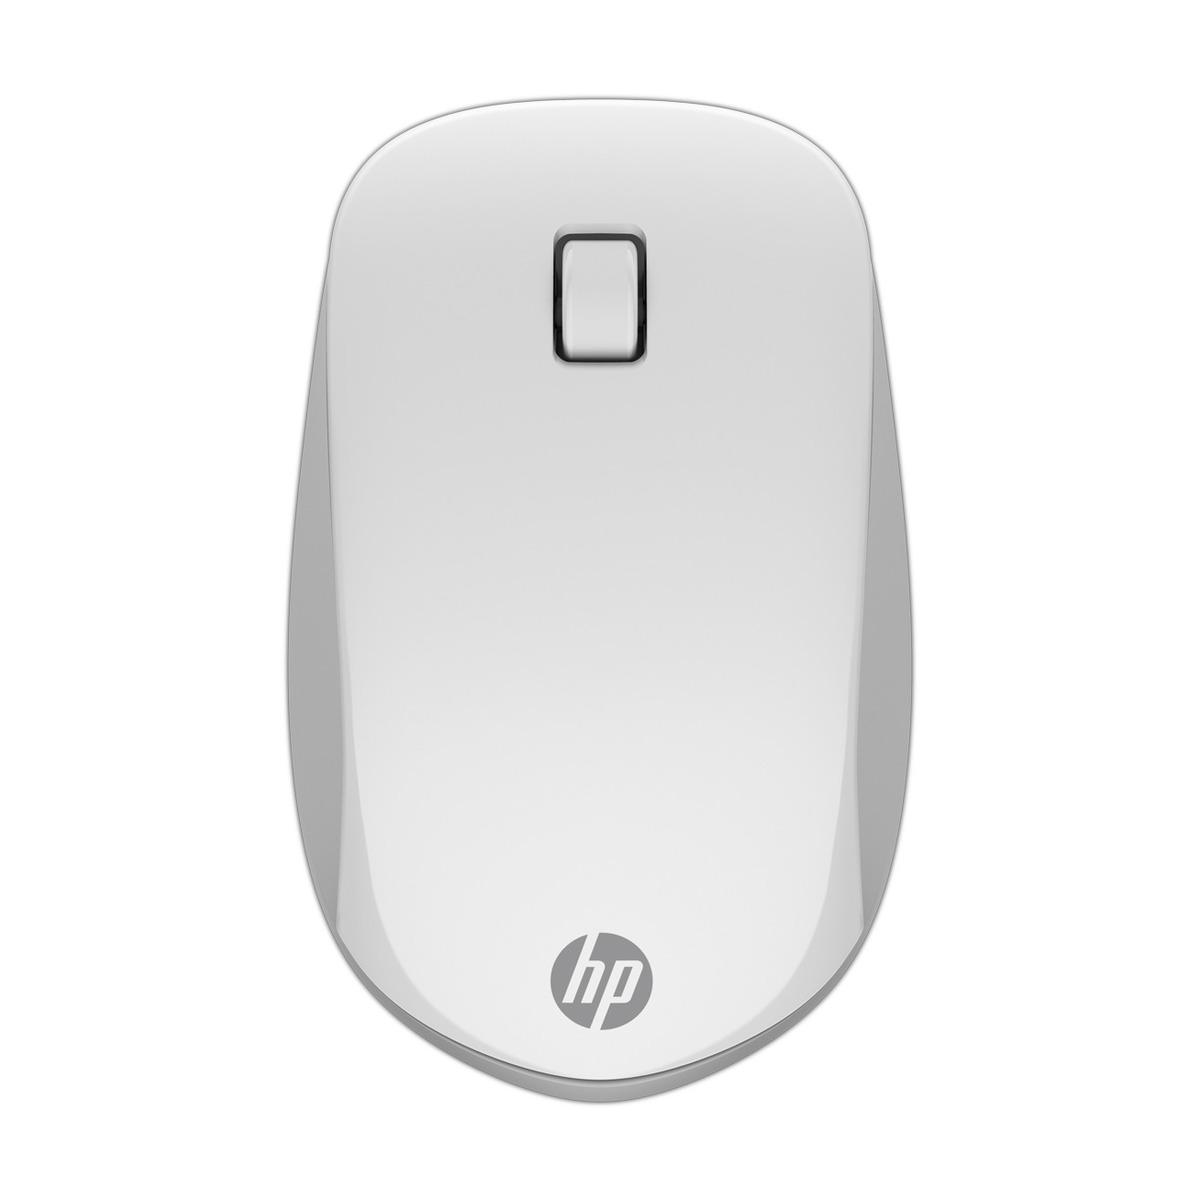 HP PAVILION 600 TRÅDLØST TASTATUR HVITT Power.no